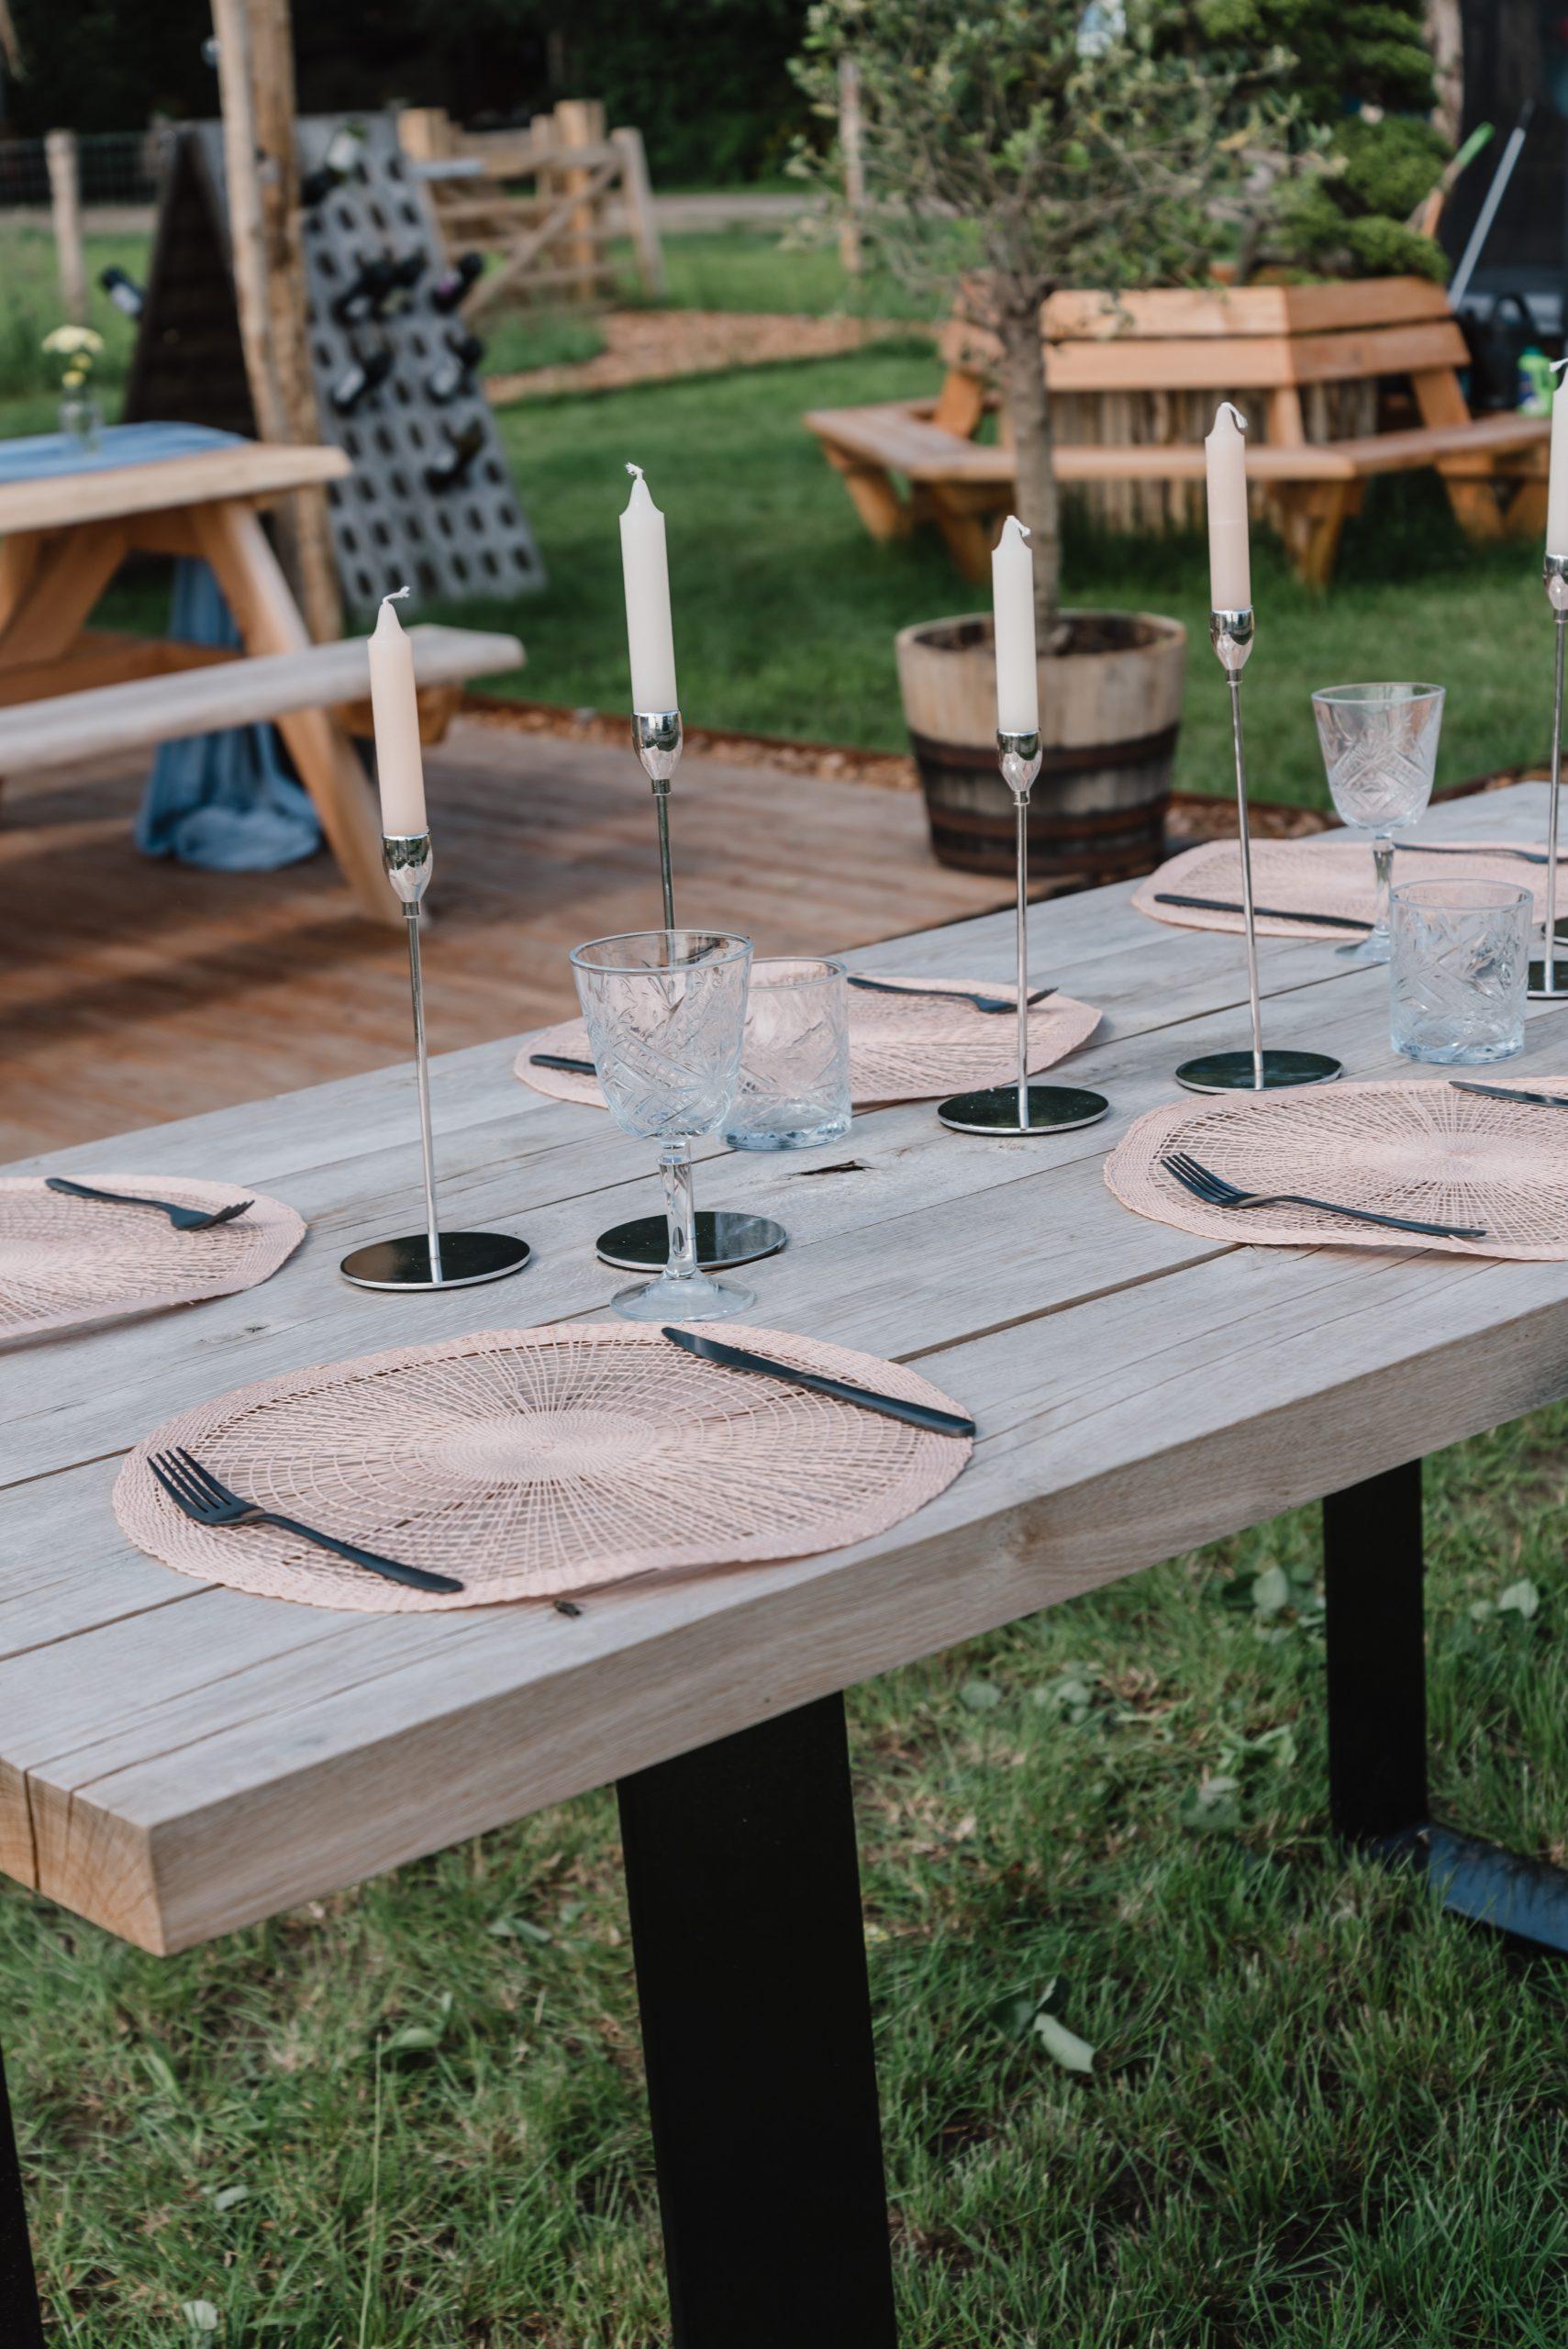 tafel kopen | stevige eikenhouten tafels | sfeervol buitenmeubiliair